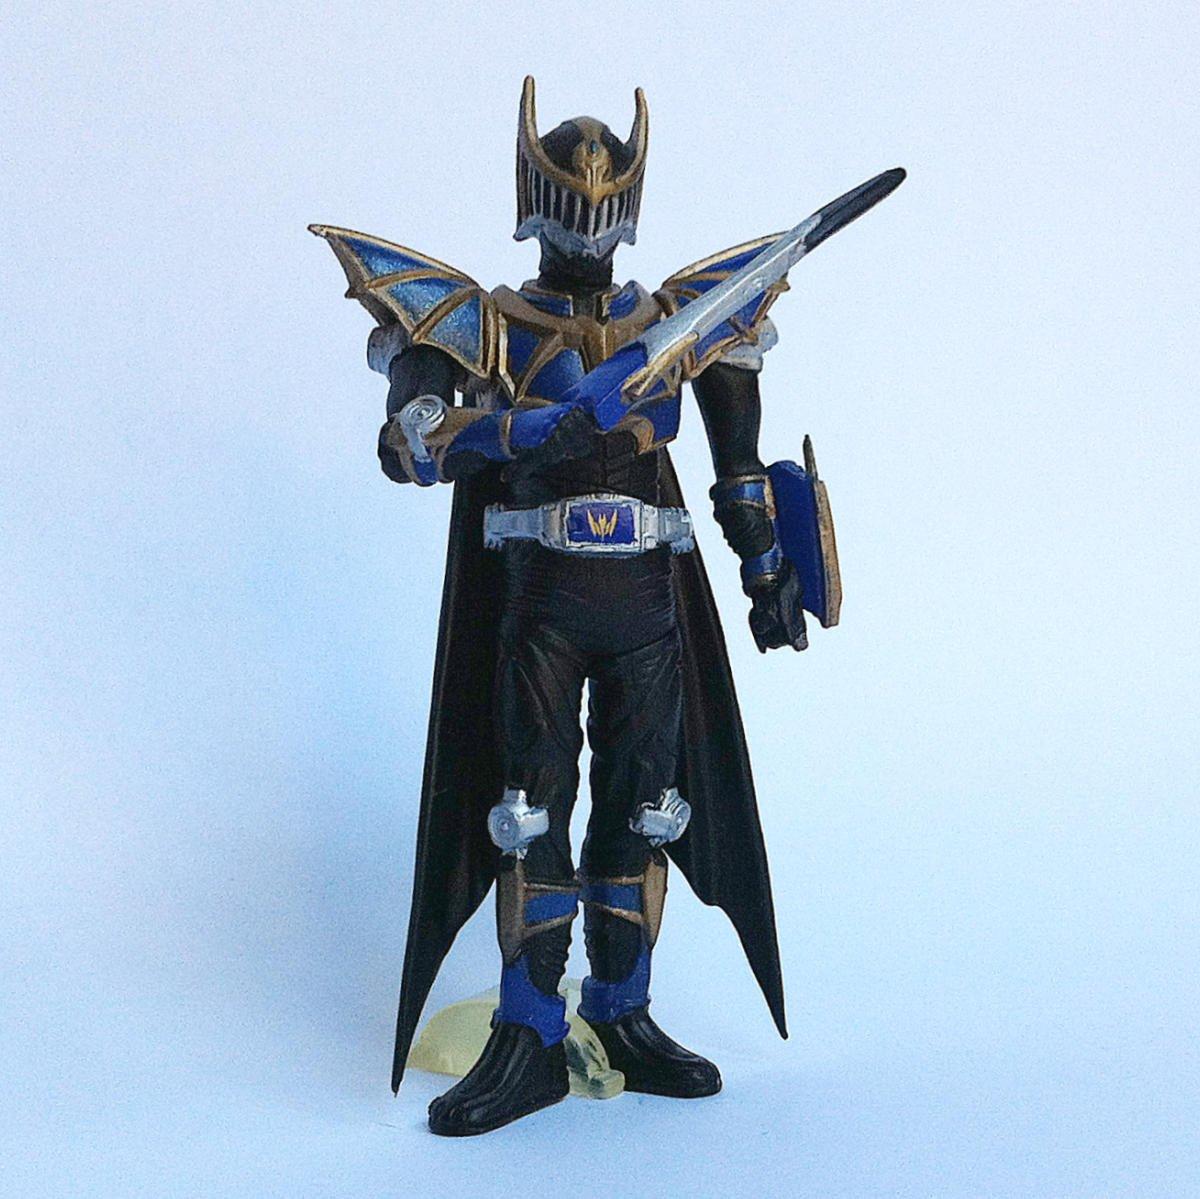 Kamen Rider Knight Survive from Kamen Rider Action Pose by Bandai